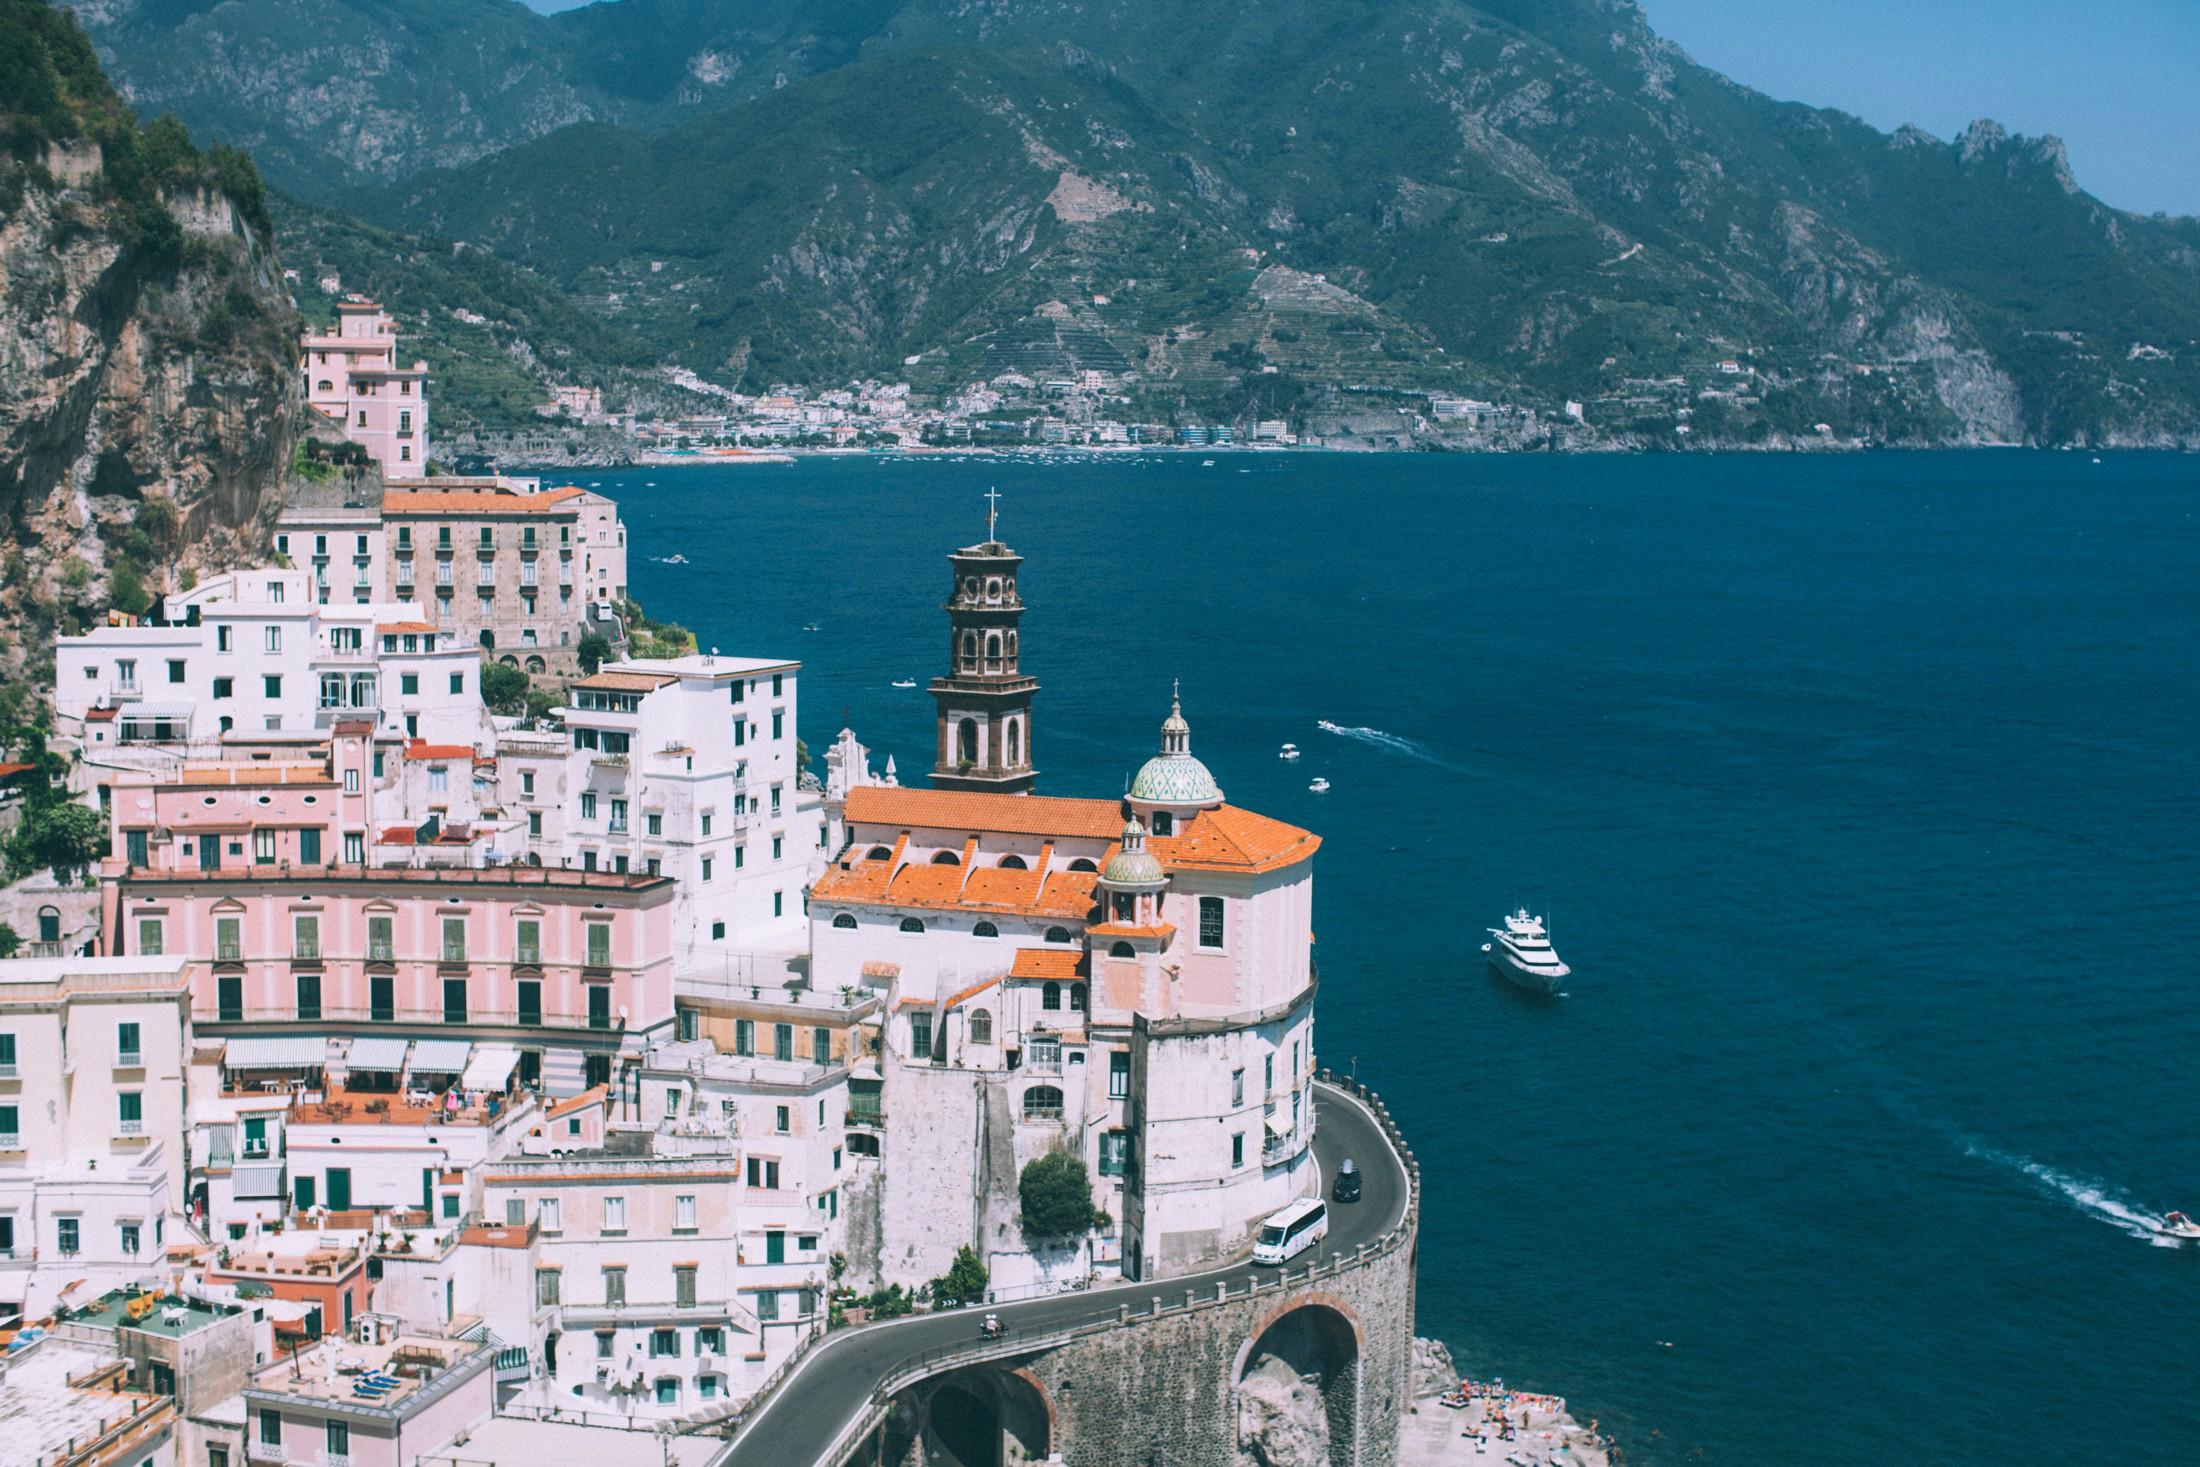 landscape from the amalfi coast